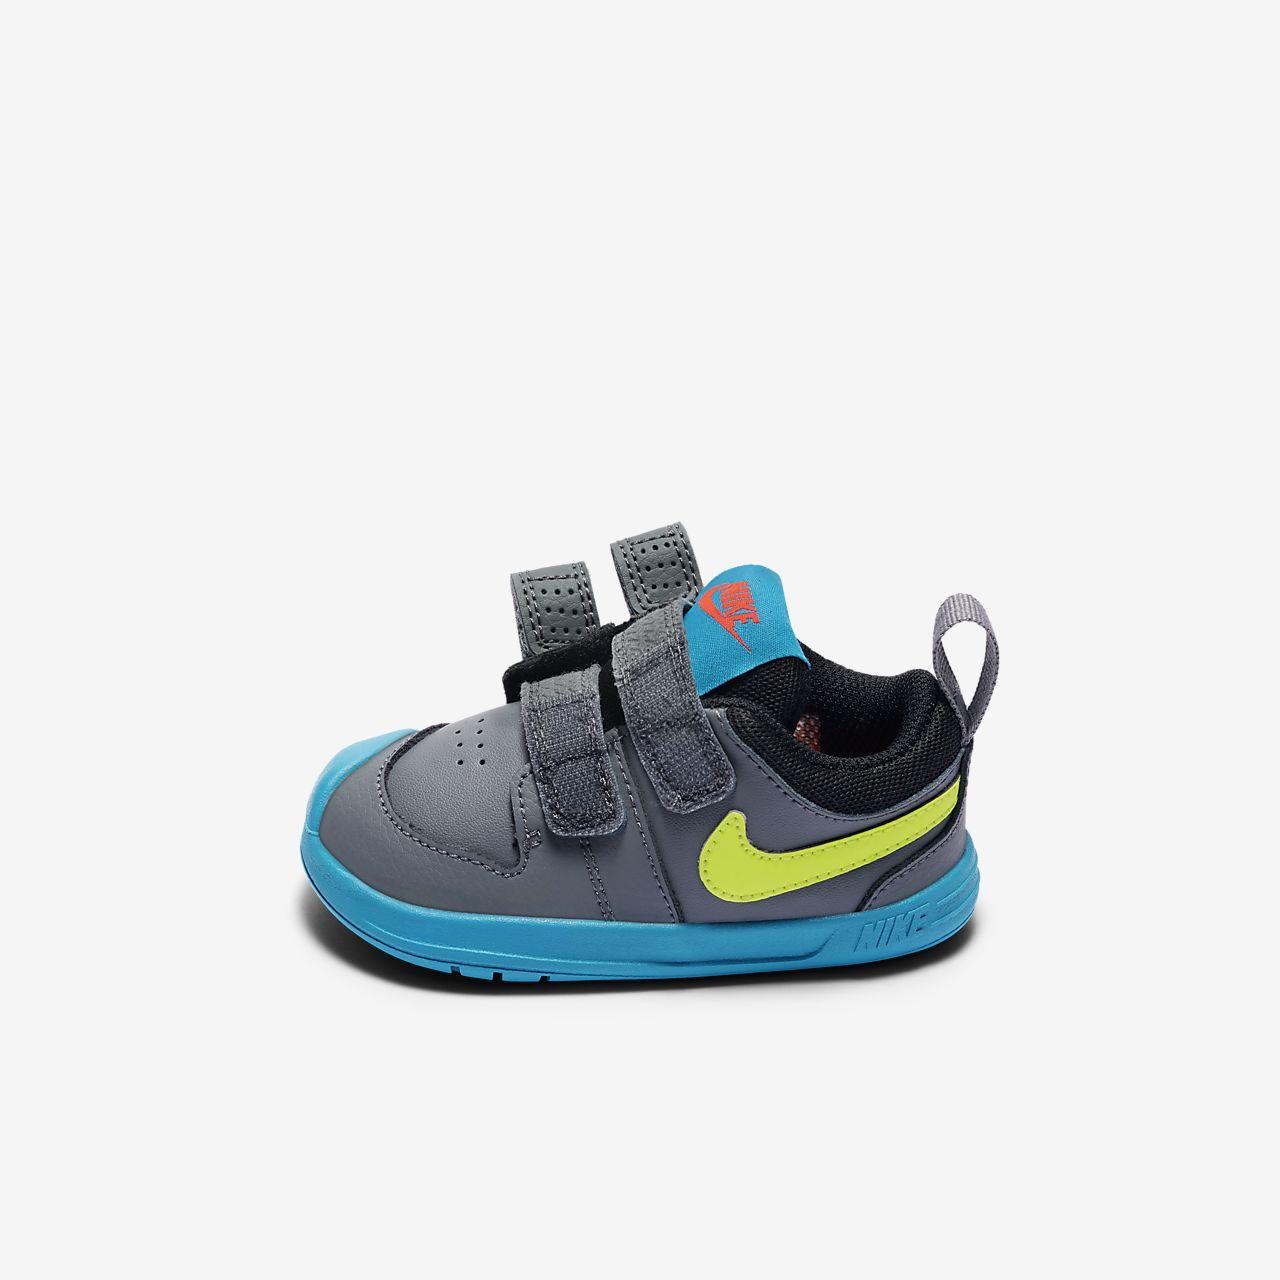 Sko Nike Pico 5 f?r babysm? barn